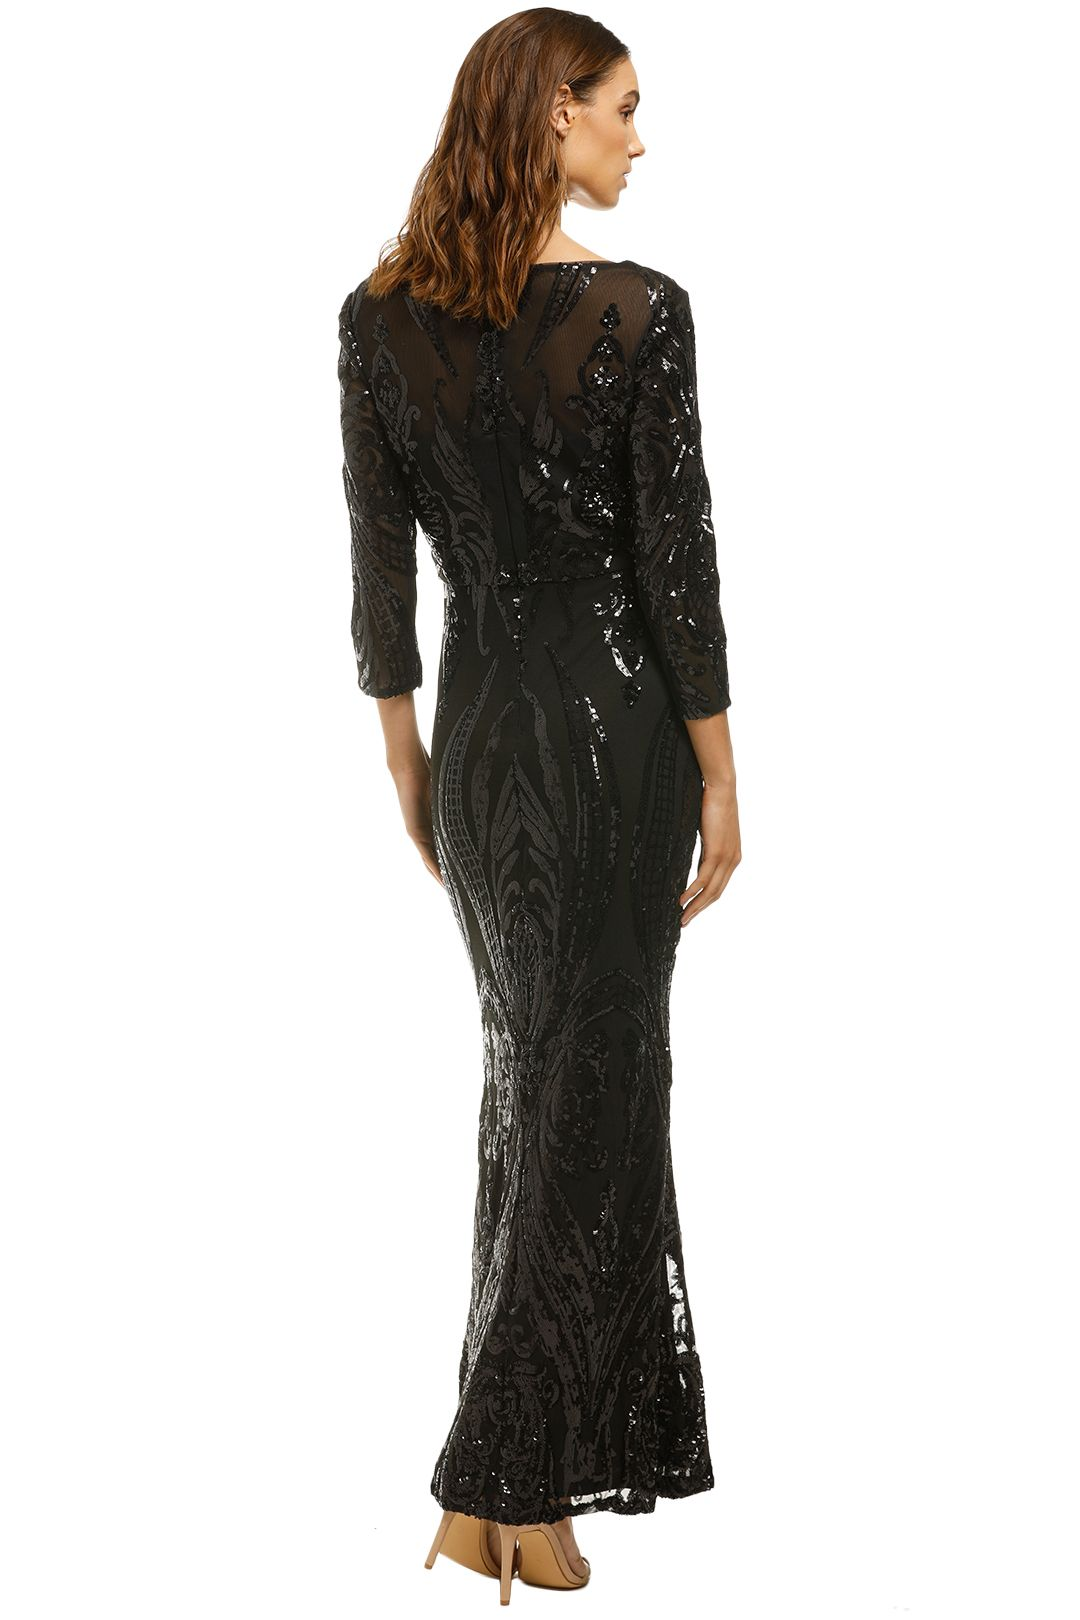 Cachet-Angelina Dress-Black-Back